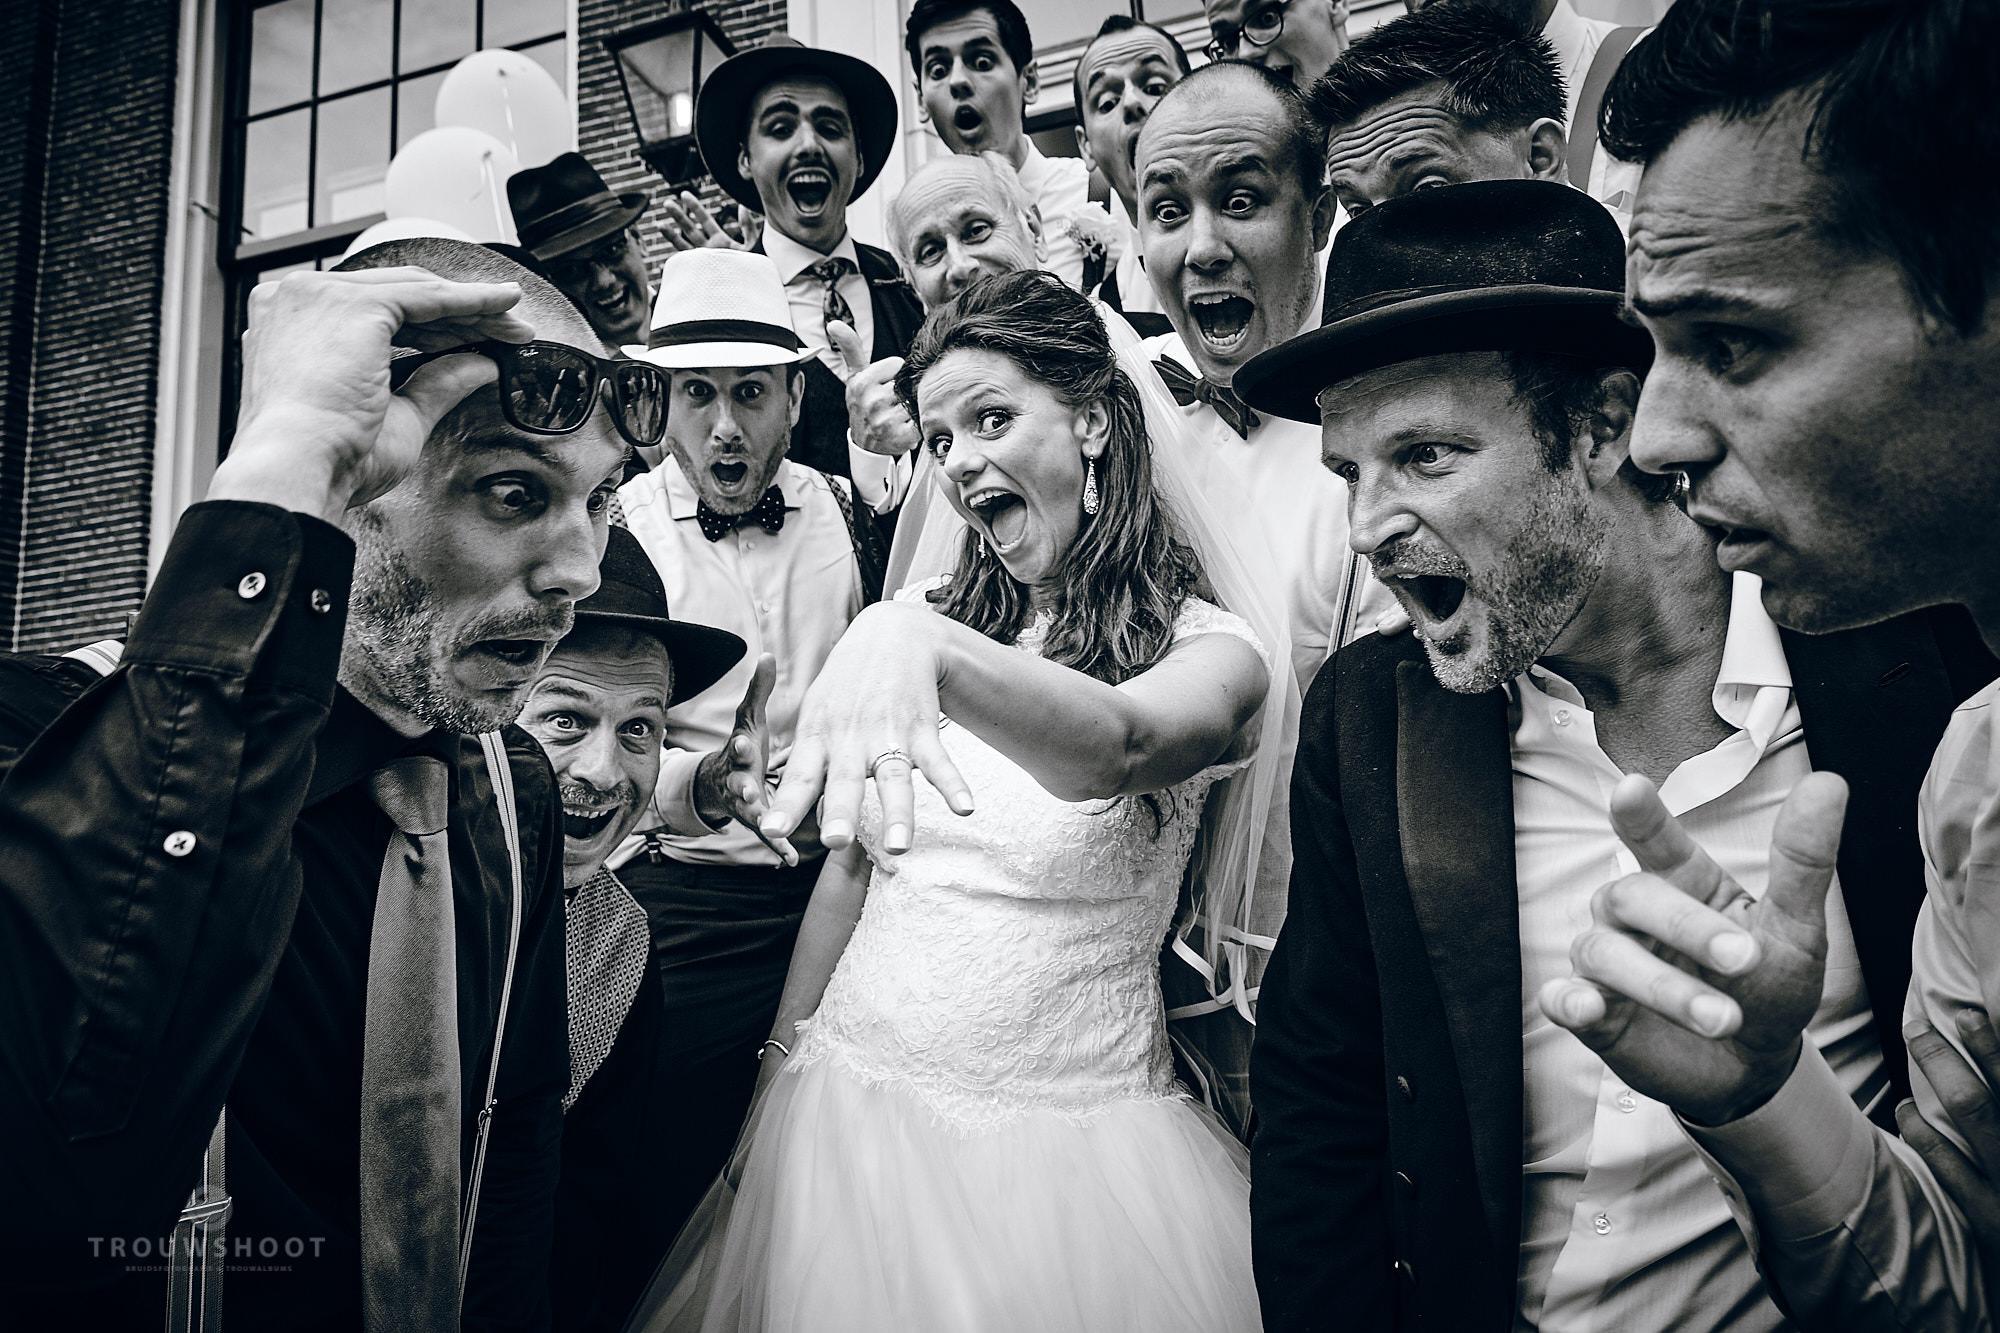 trouwshoot_bruidsfotografie_trouwfoto_301.jpg